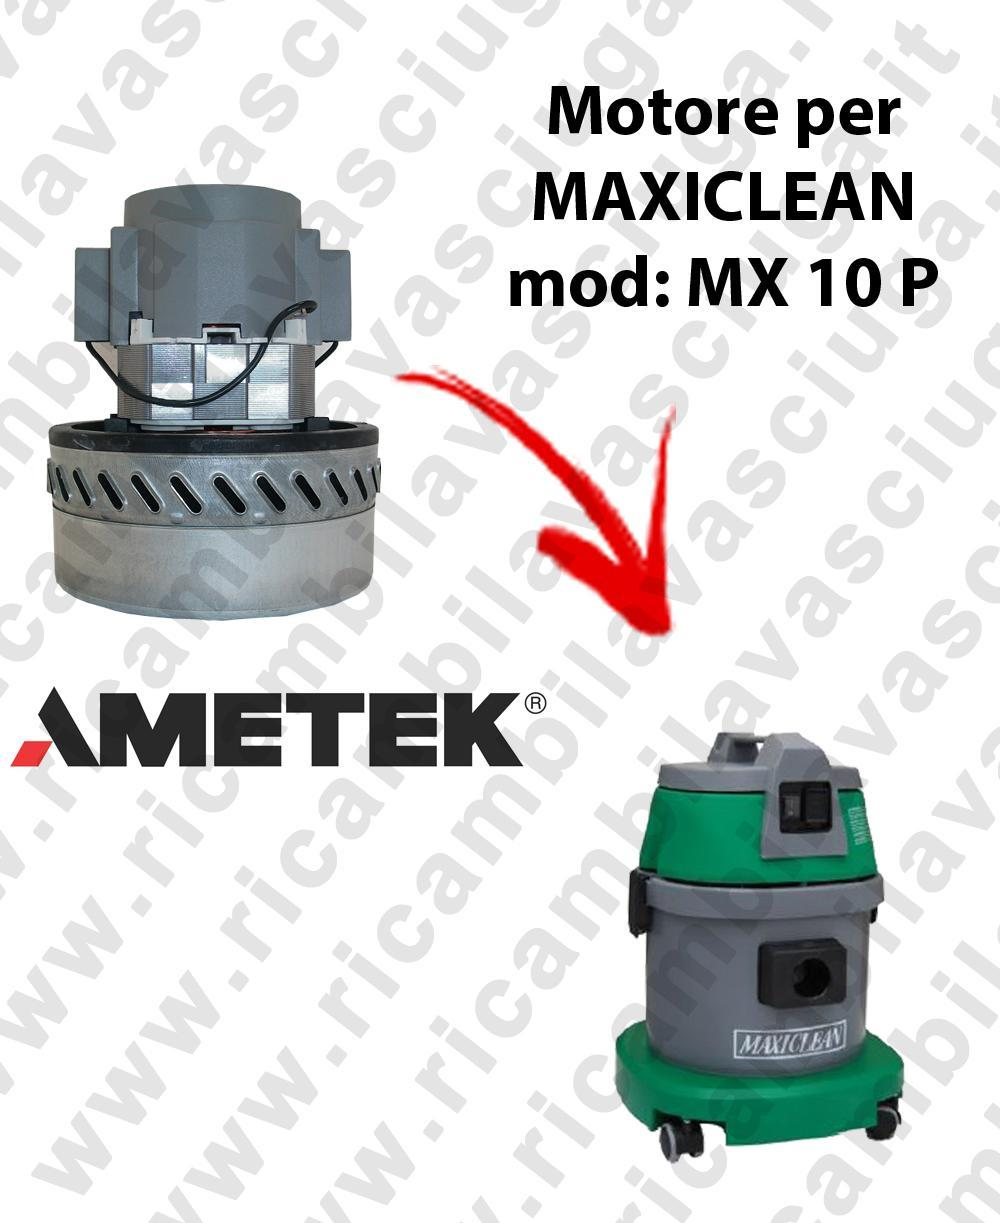 MX 10 P Saugmotor AMETEK für Staubsauger MAXICLEAN